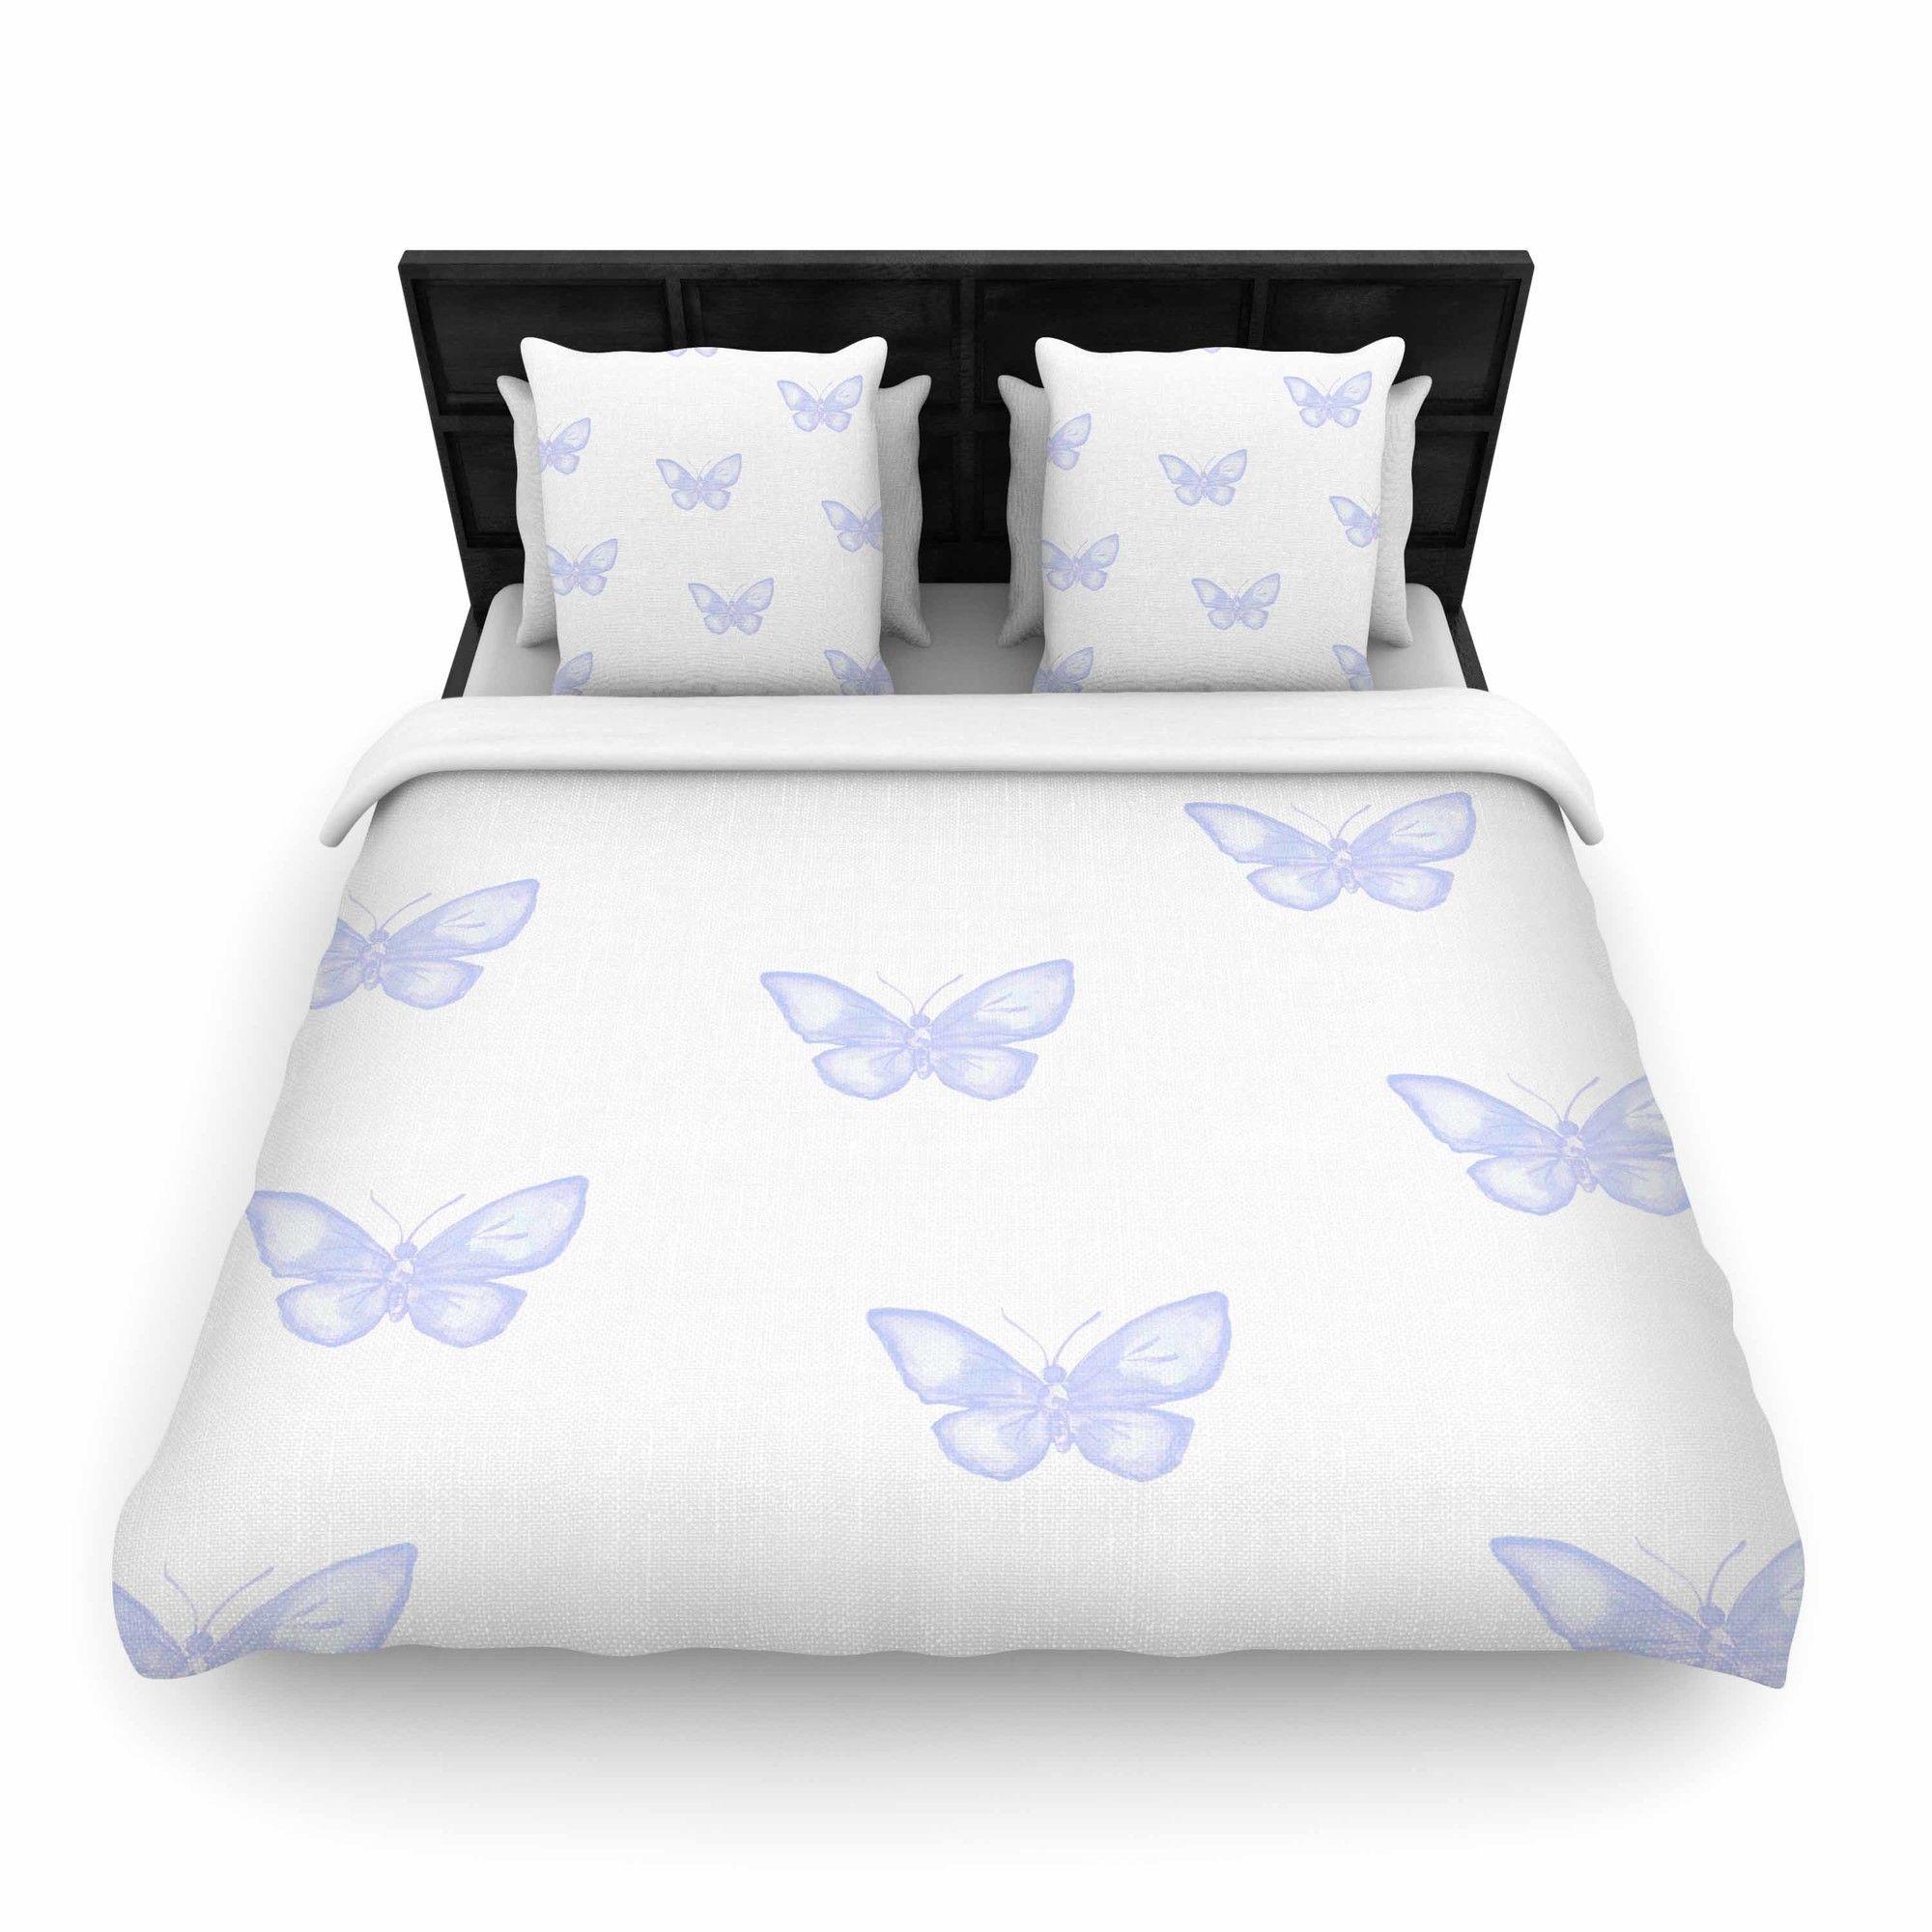 Many Lavender Butterflies Woven Duvet Cover